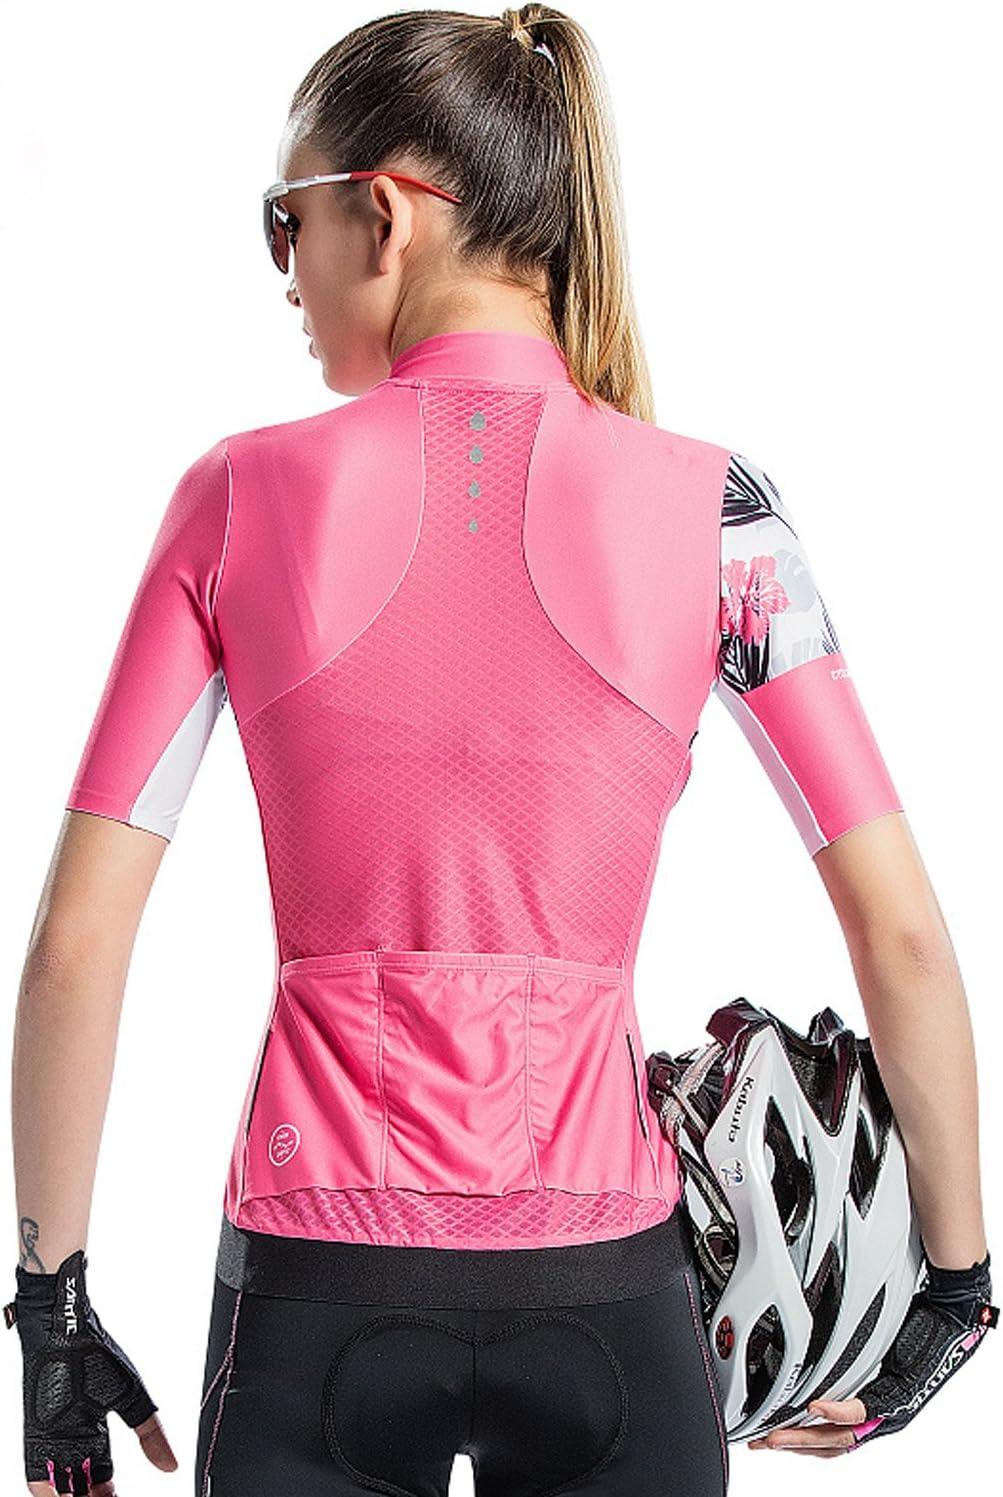 Santic Radtrikot Damen Kurzarm Fahrradtrikot Damen Fahrradshirt Radshirt Kurzarm Sommer mit Taschen Rosa